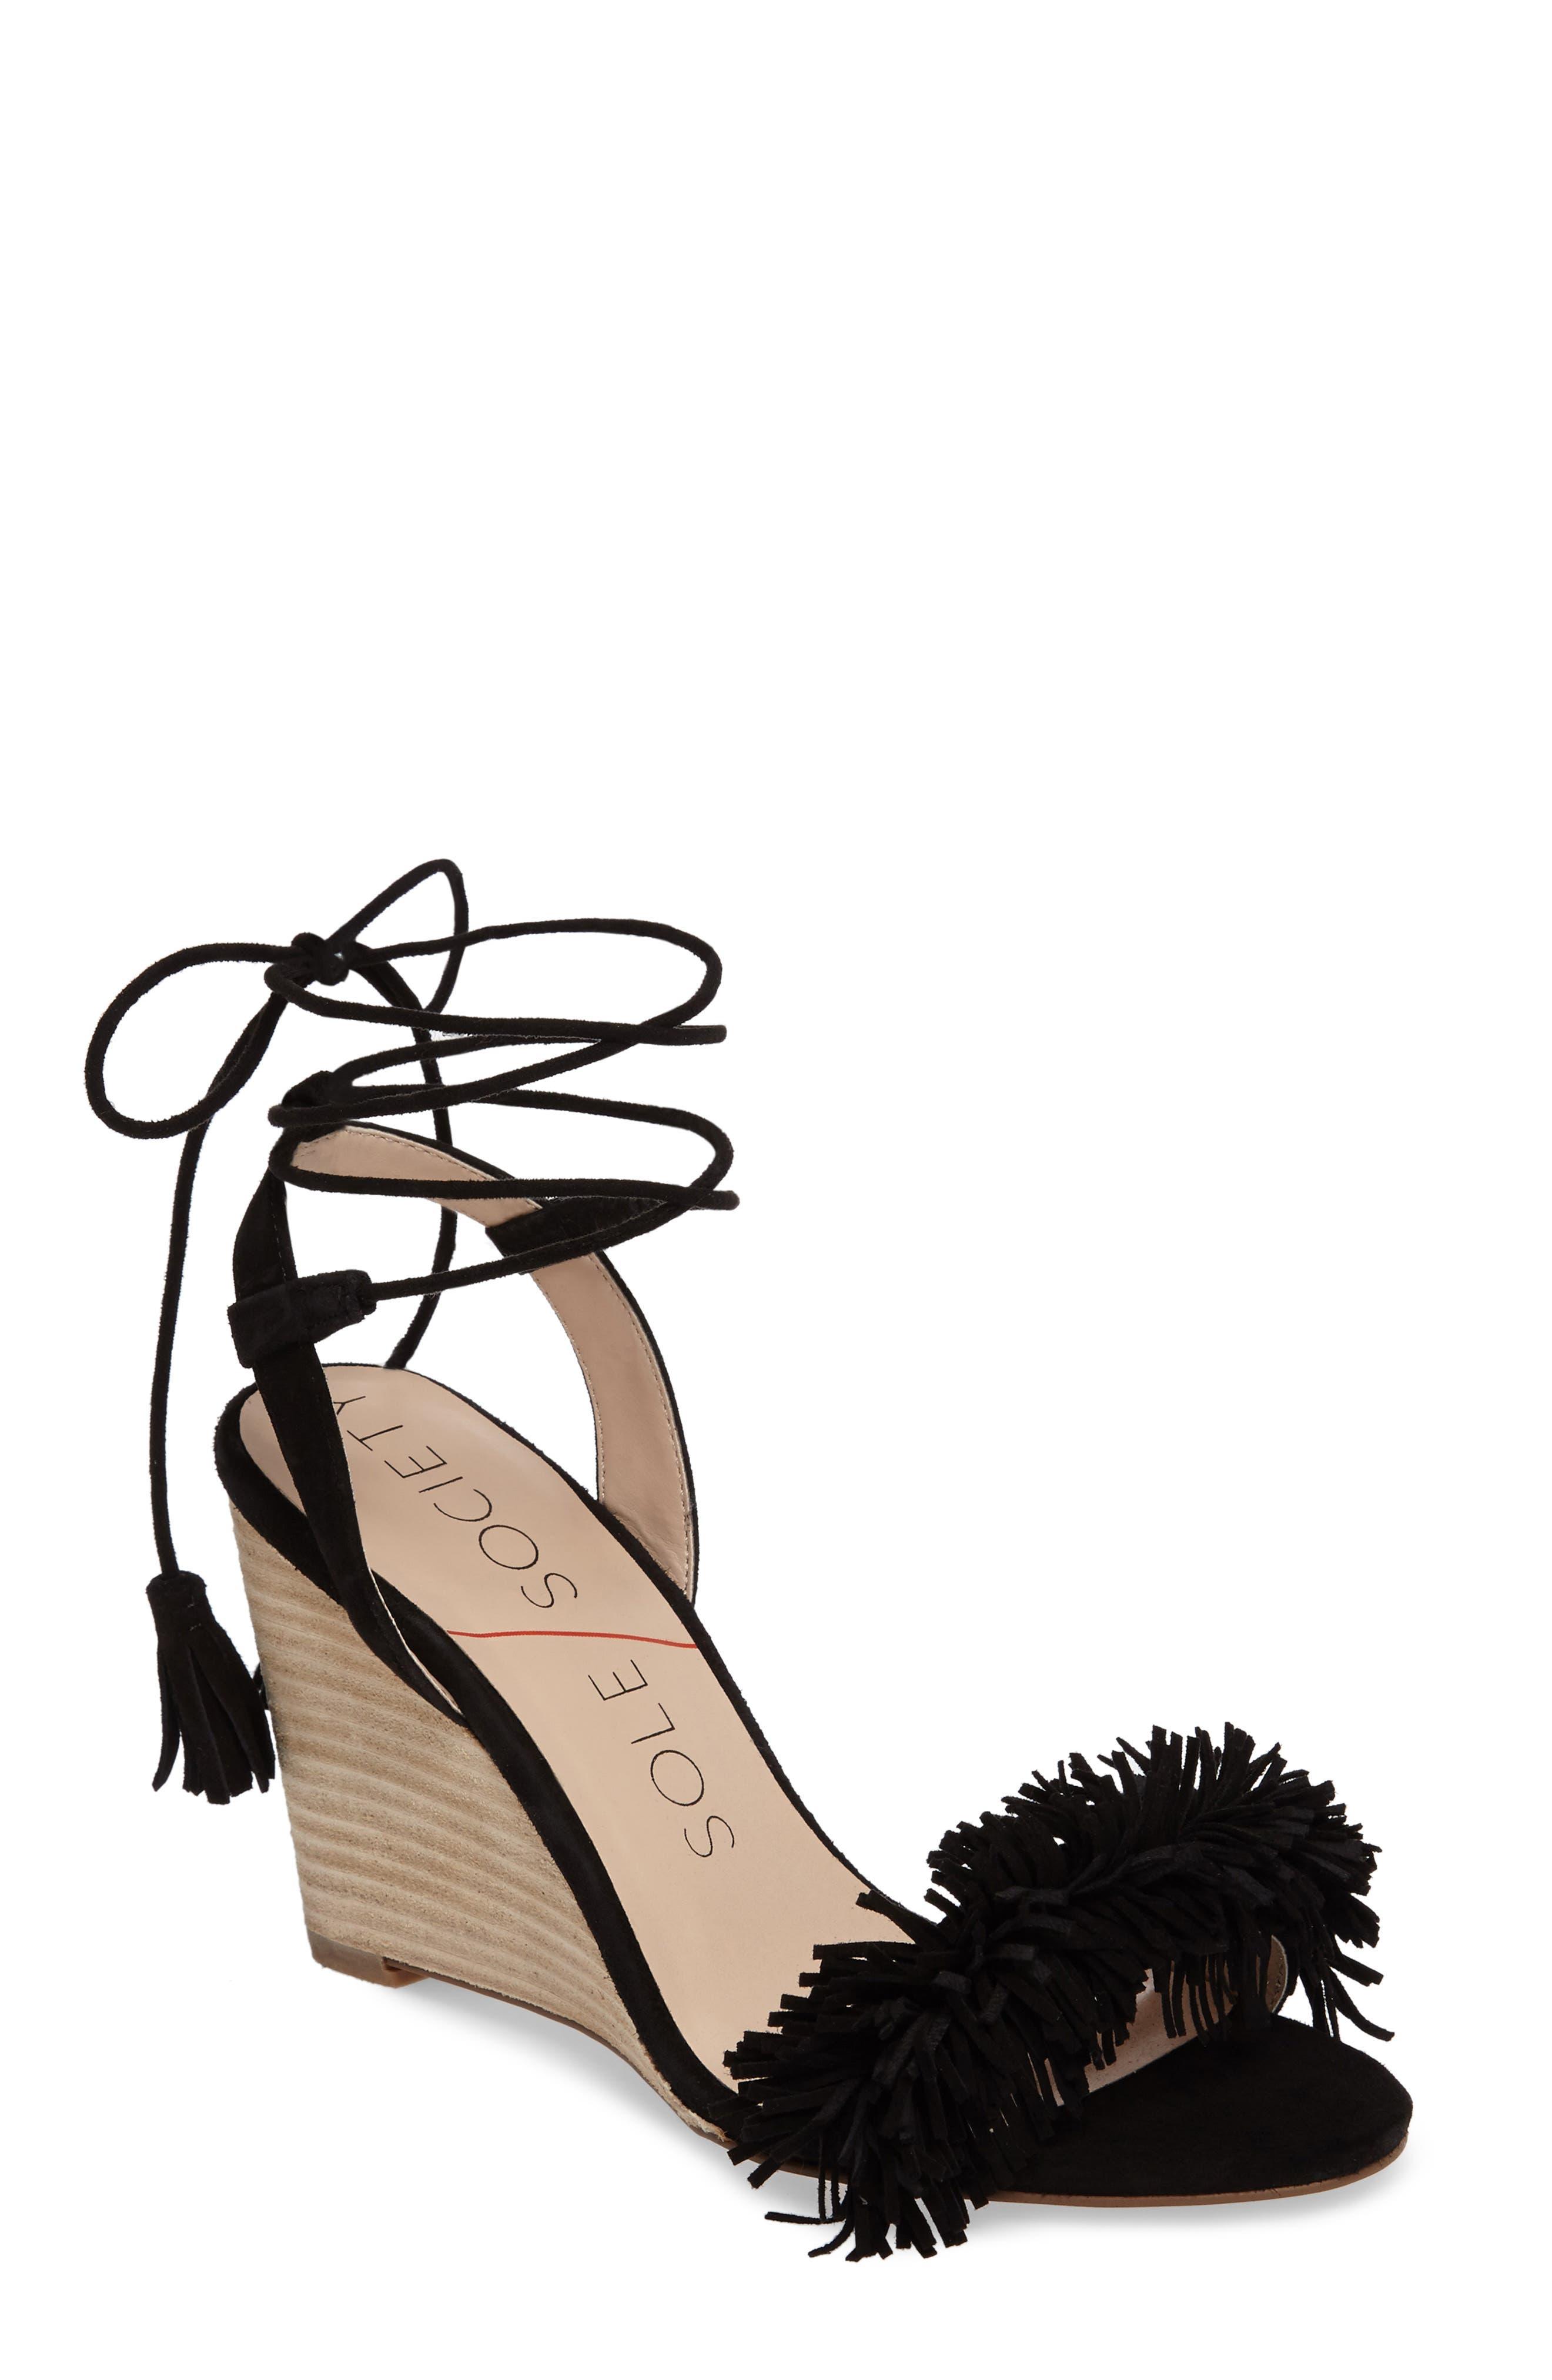 SOLE SOCIETY, Rosea Ankle Wrap Sandal, Main thumbnail 1, color, 001